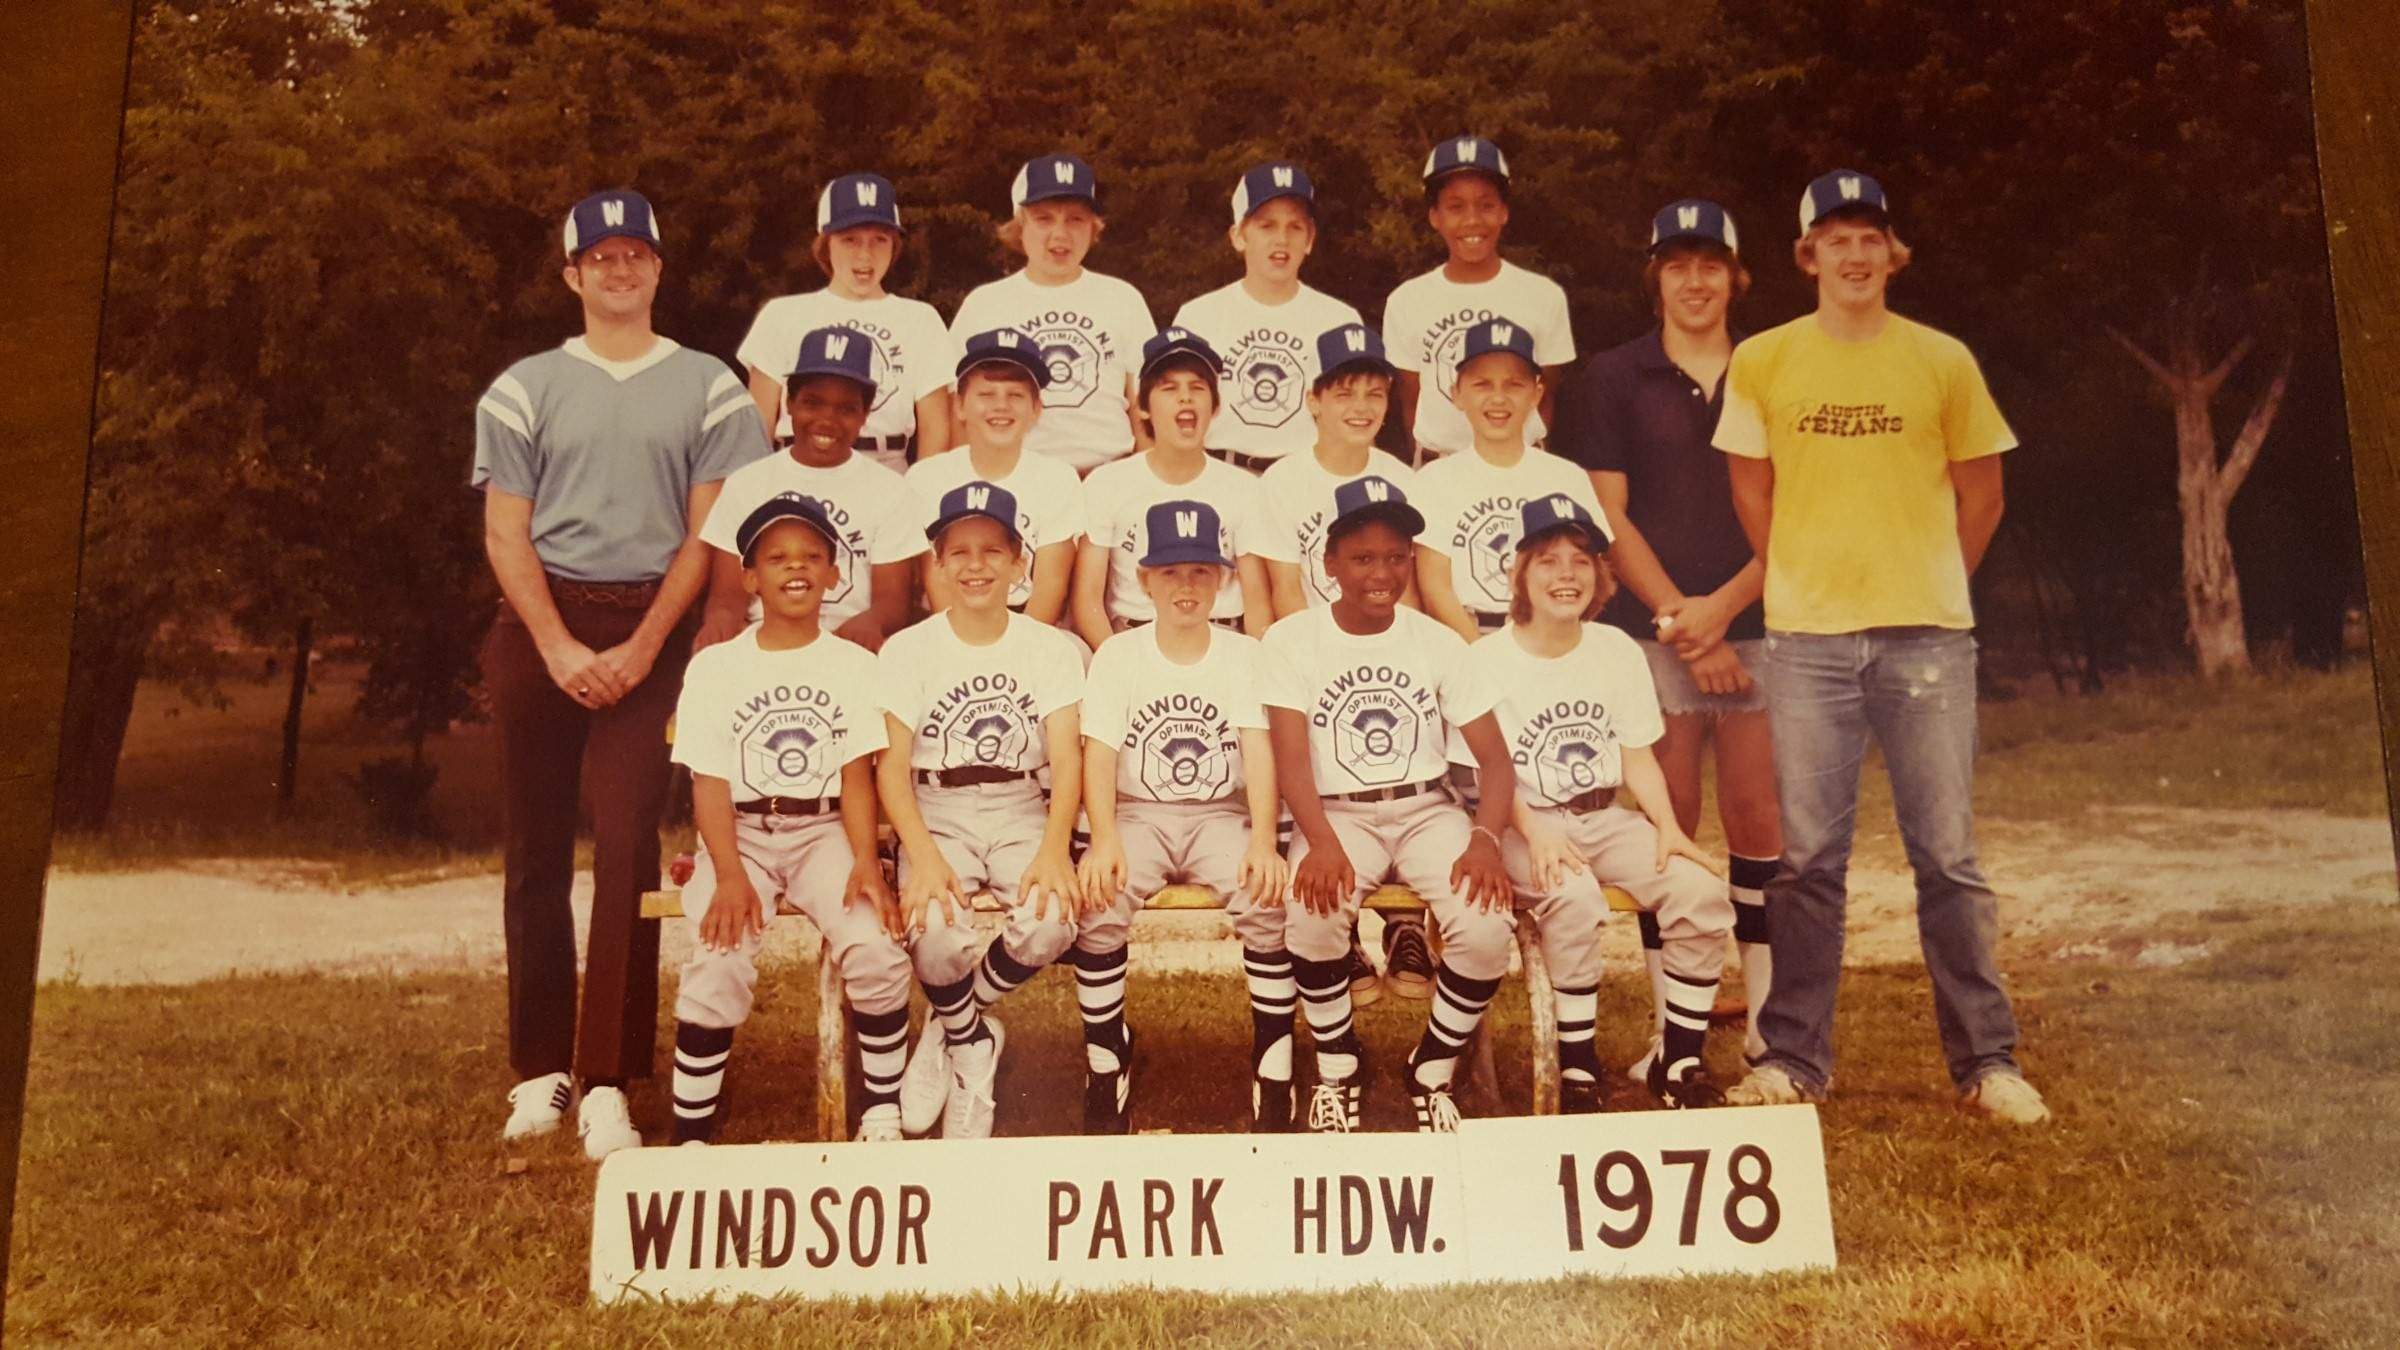 Little League Baseball & Windsor